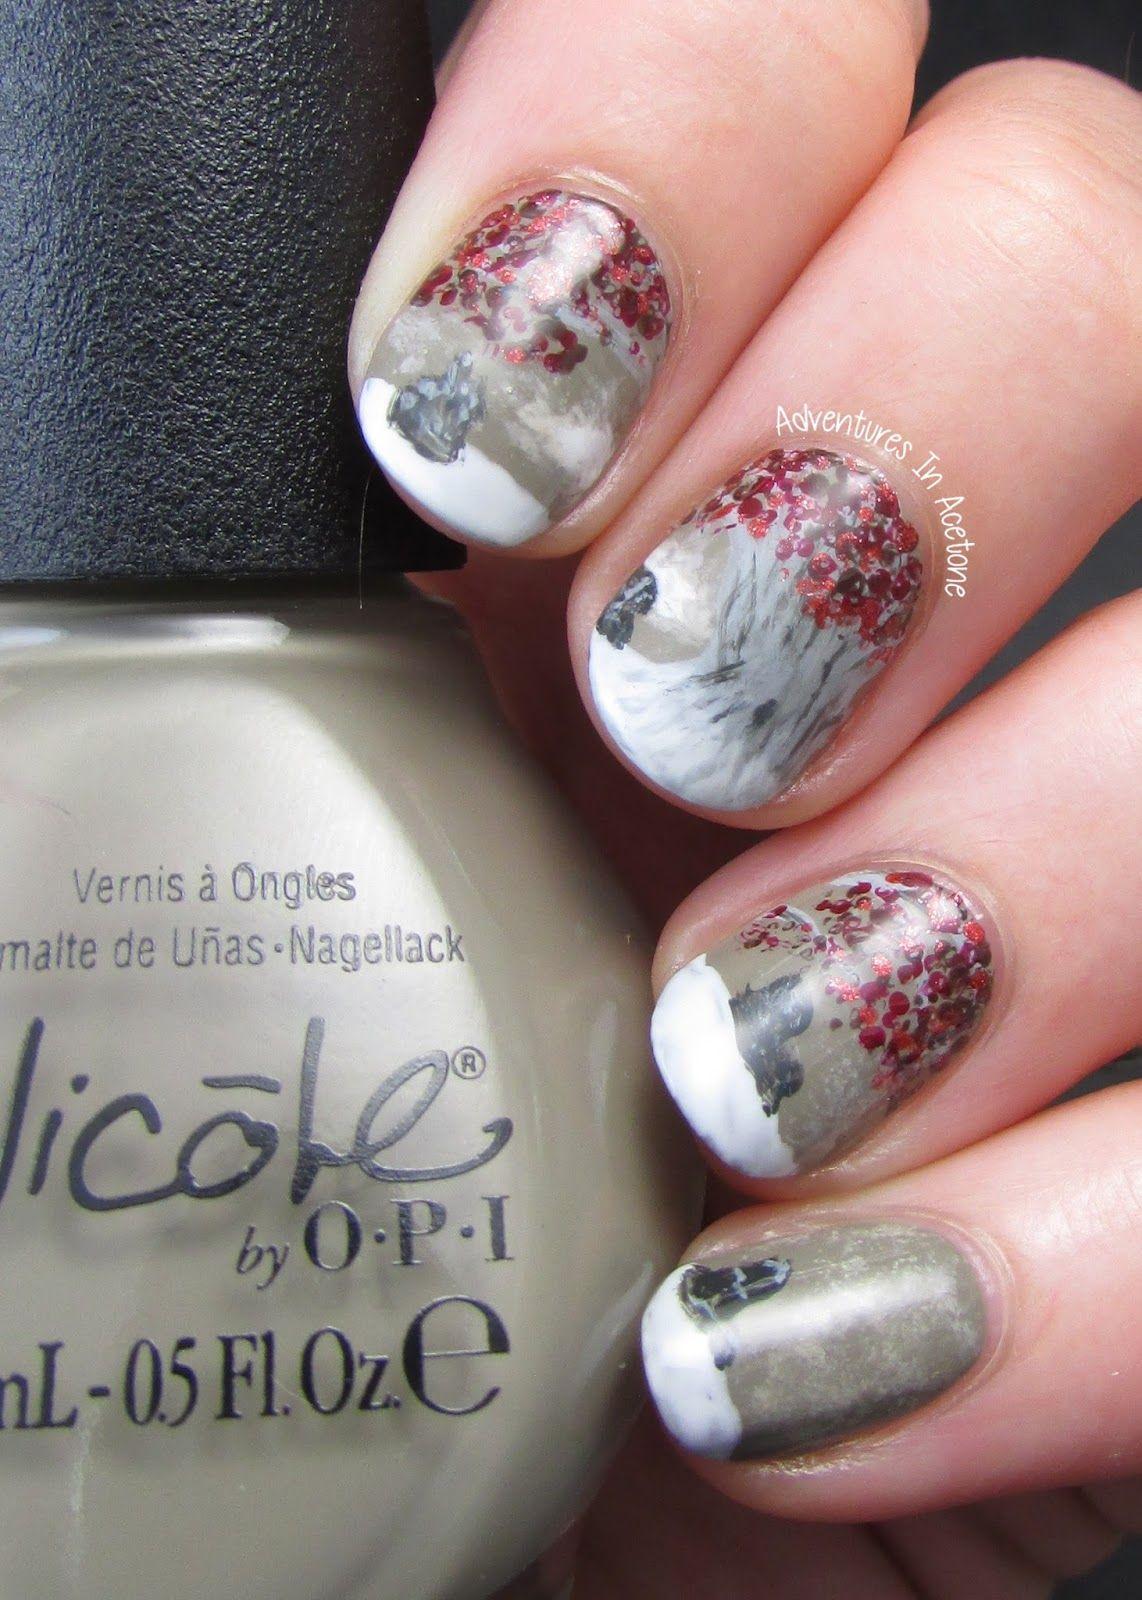 Attractive Game Of Thrones Nail Polish Illustration - Nail Art Ideas ...